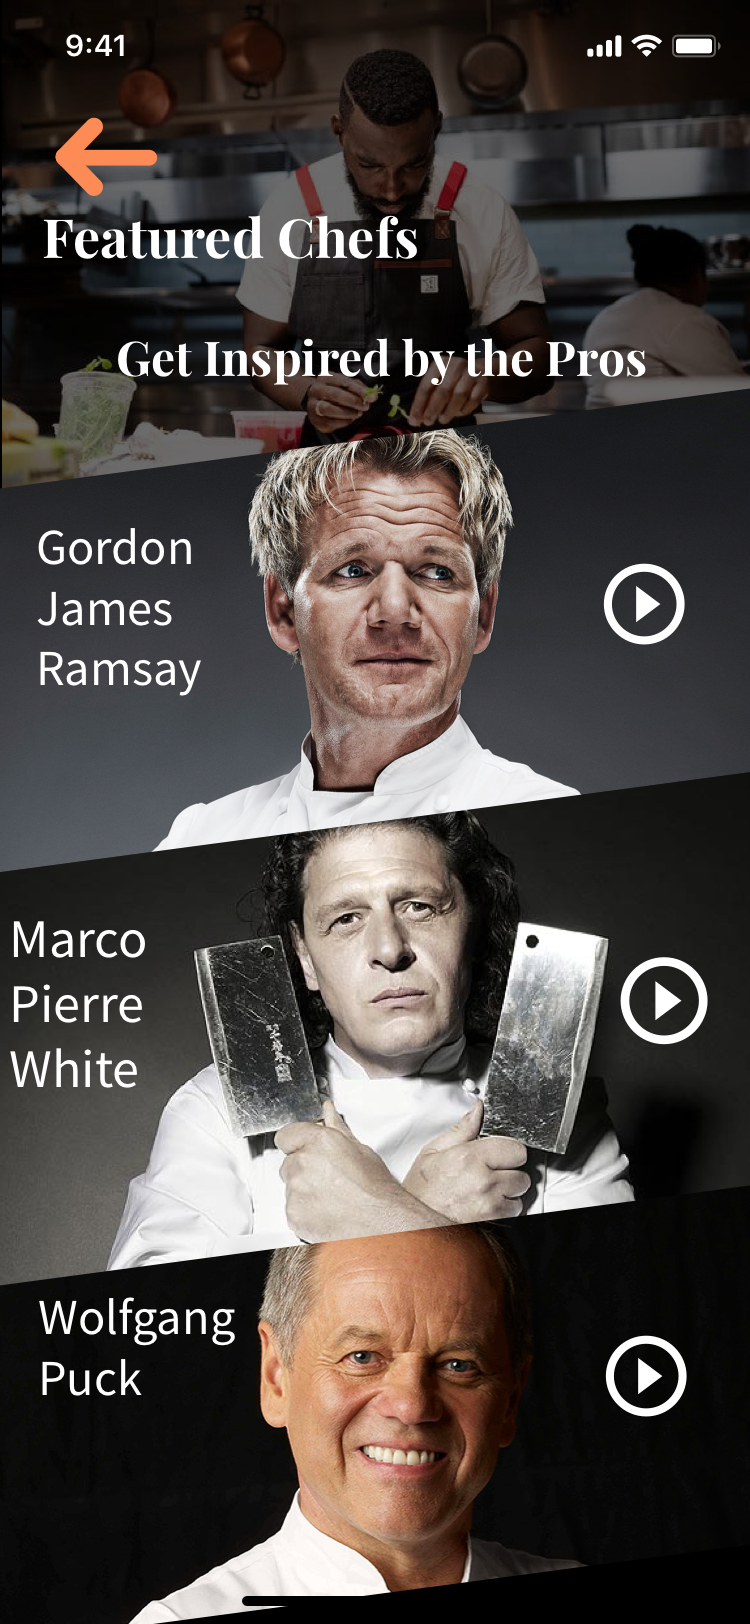 Featured-Chefs